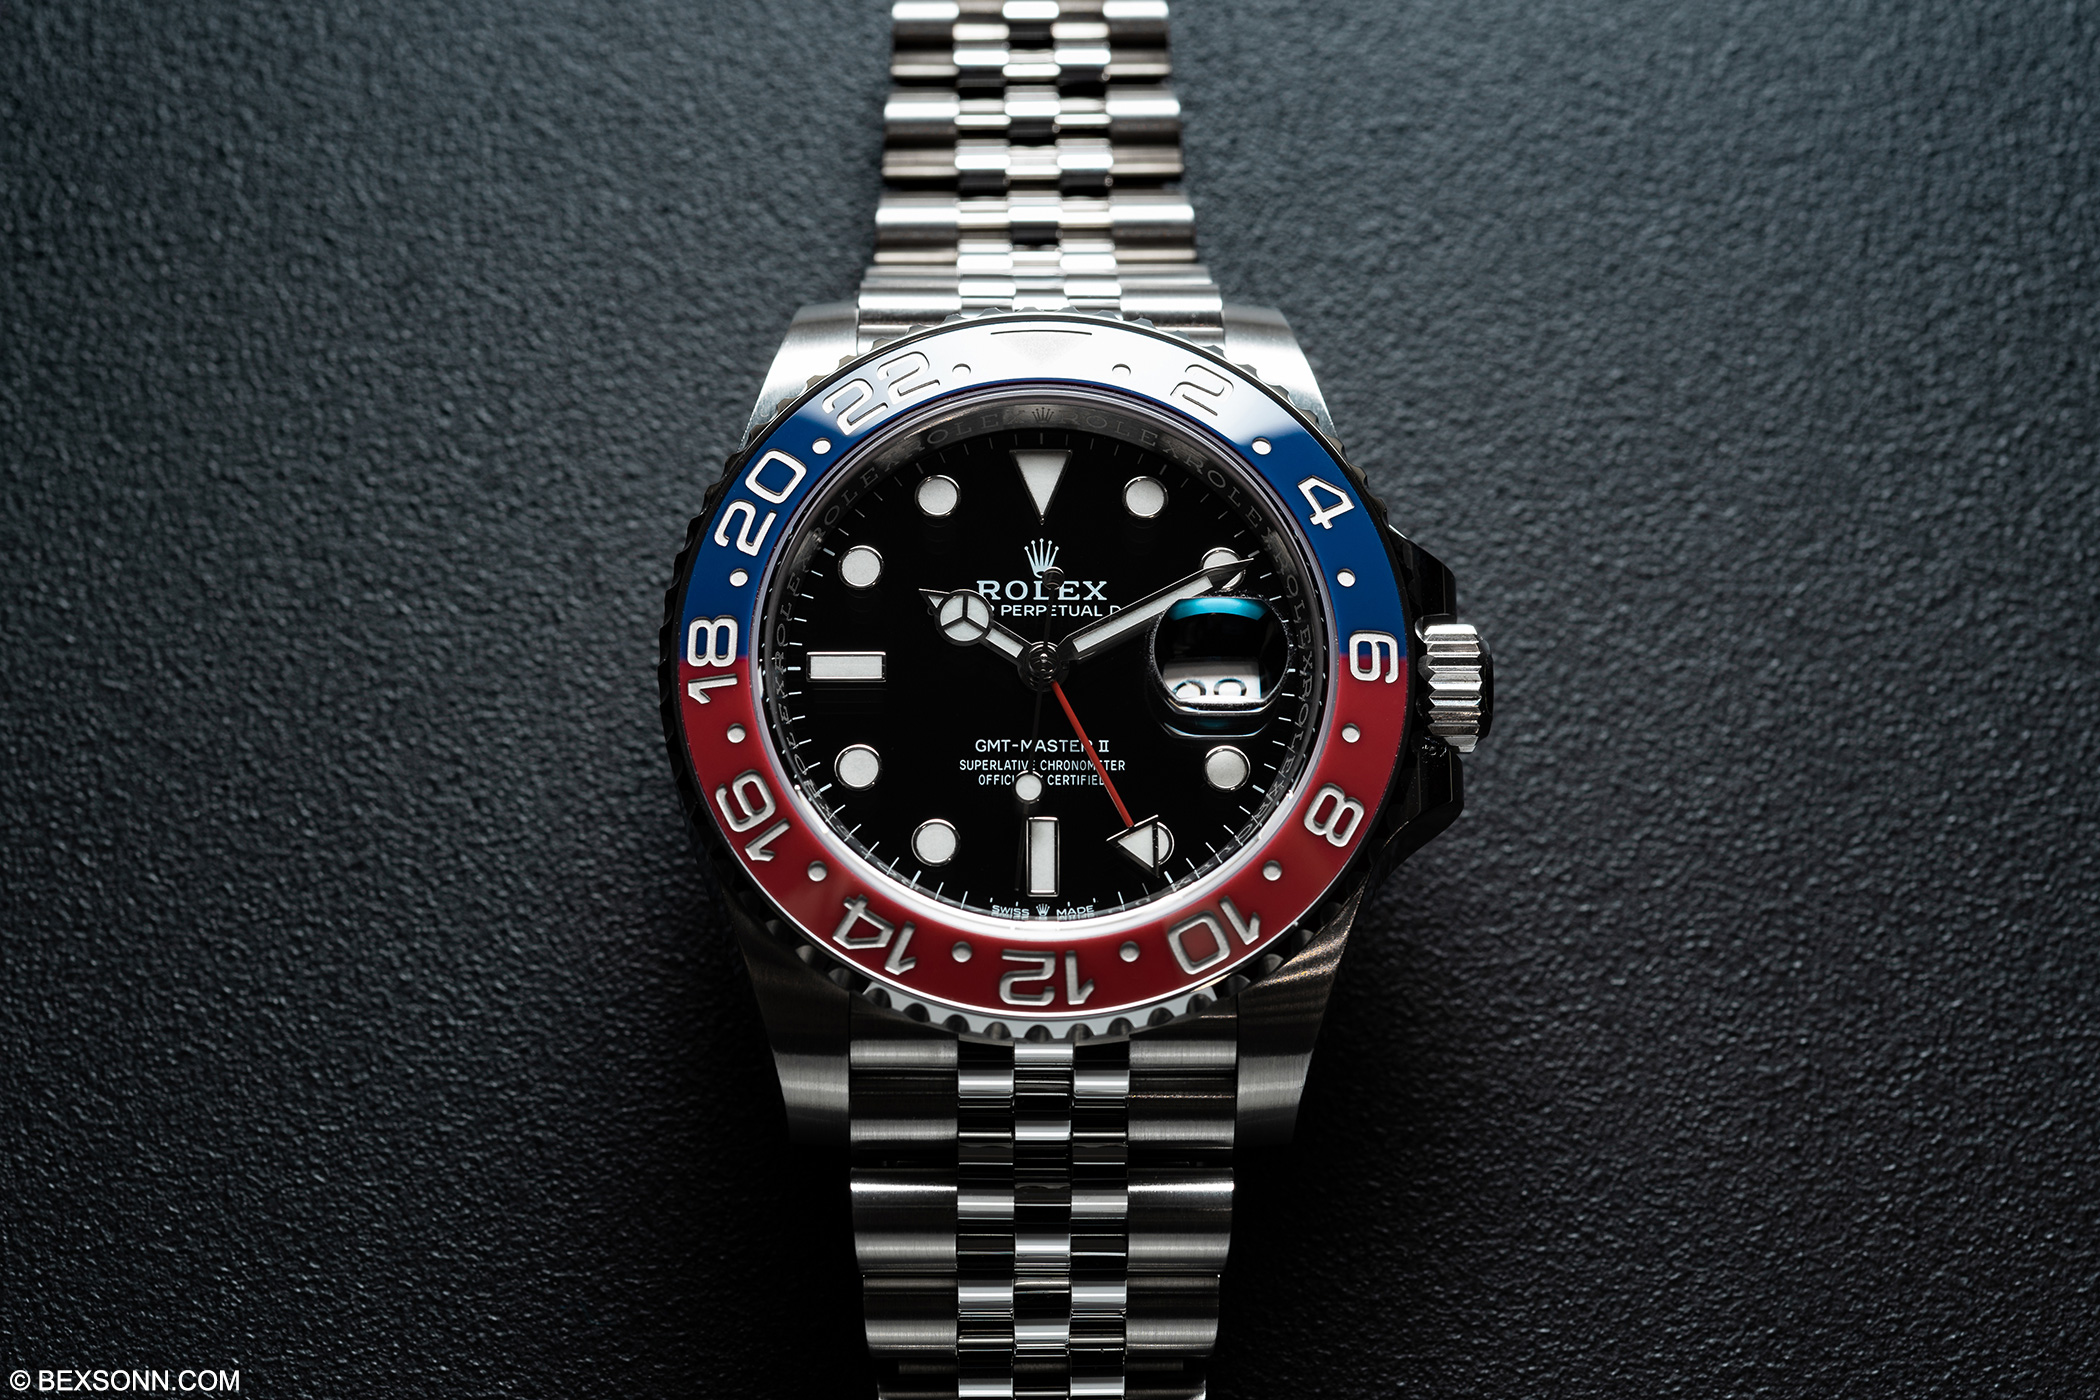 The New Steel Rolex Gmt Master Ii Pepsi Bexsonn